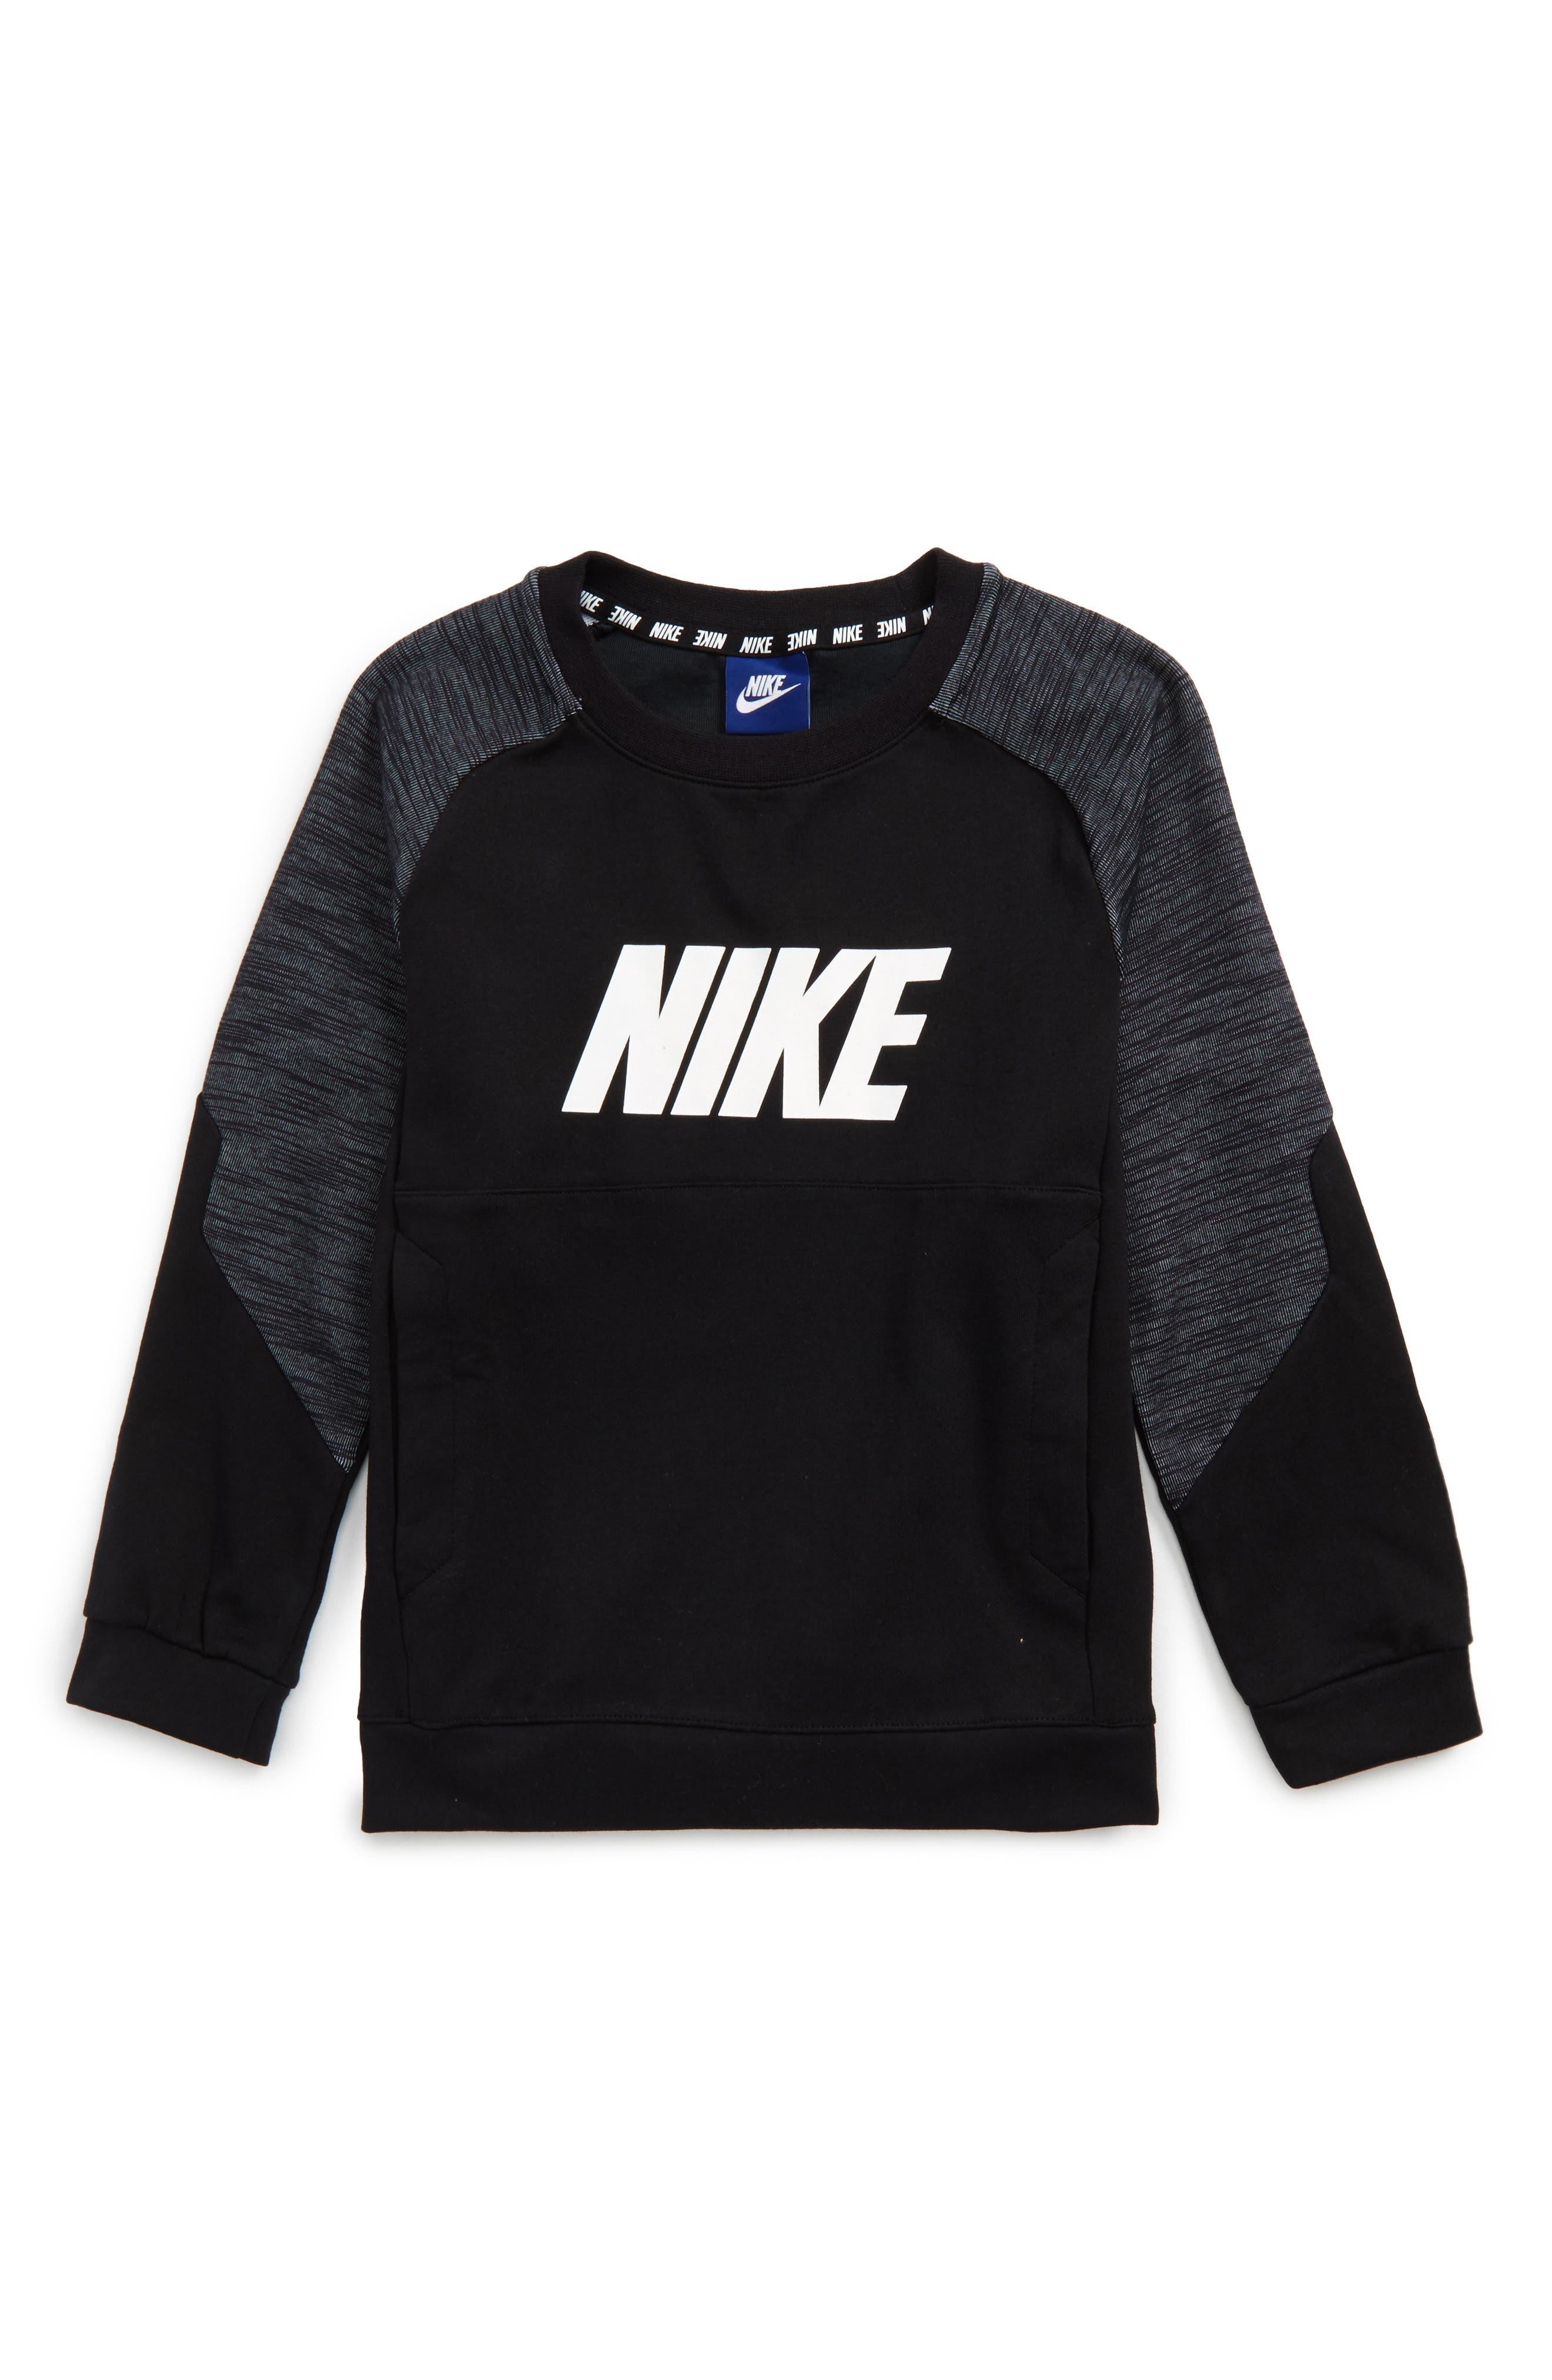 Nike Colorblock Raglan Logo Sweatshirt (Little Boys & Big Boys)